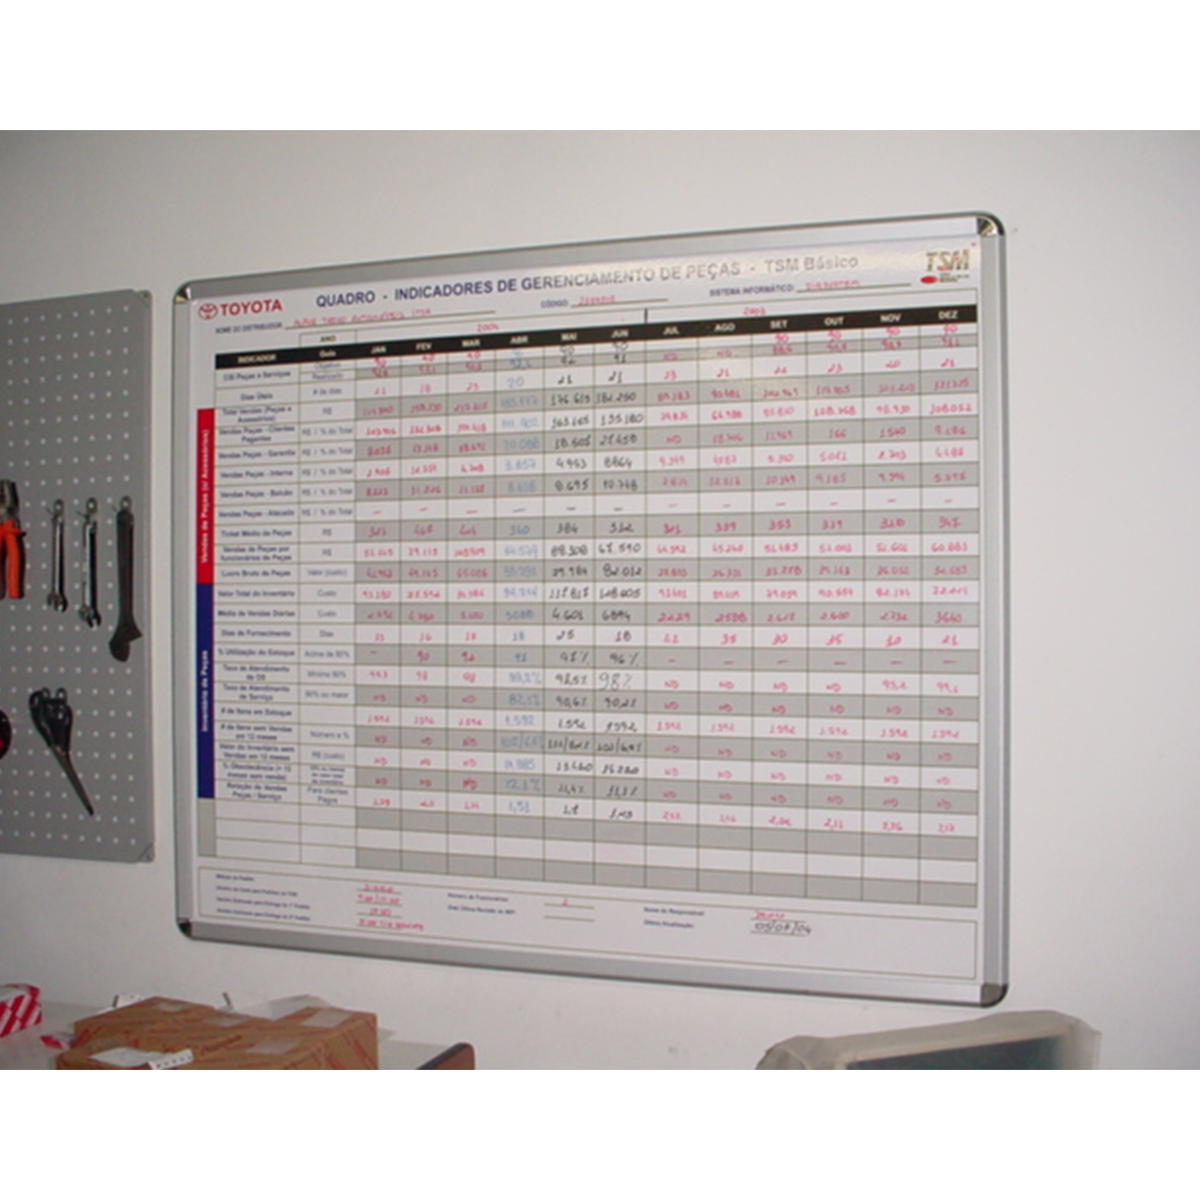 Toyota quadro indicadores de gerenciamento de peas conecta lightbox fandeluxe Images